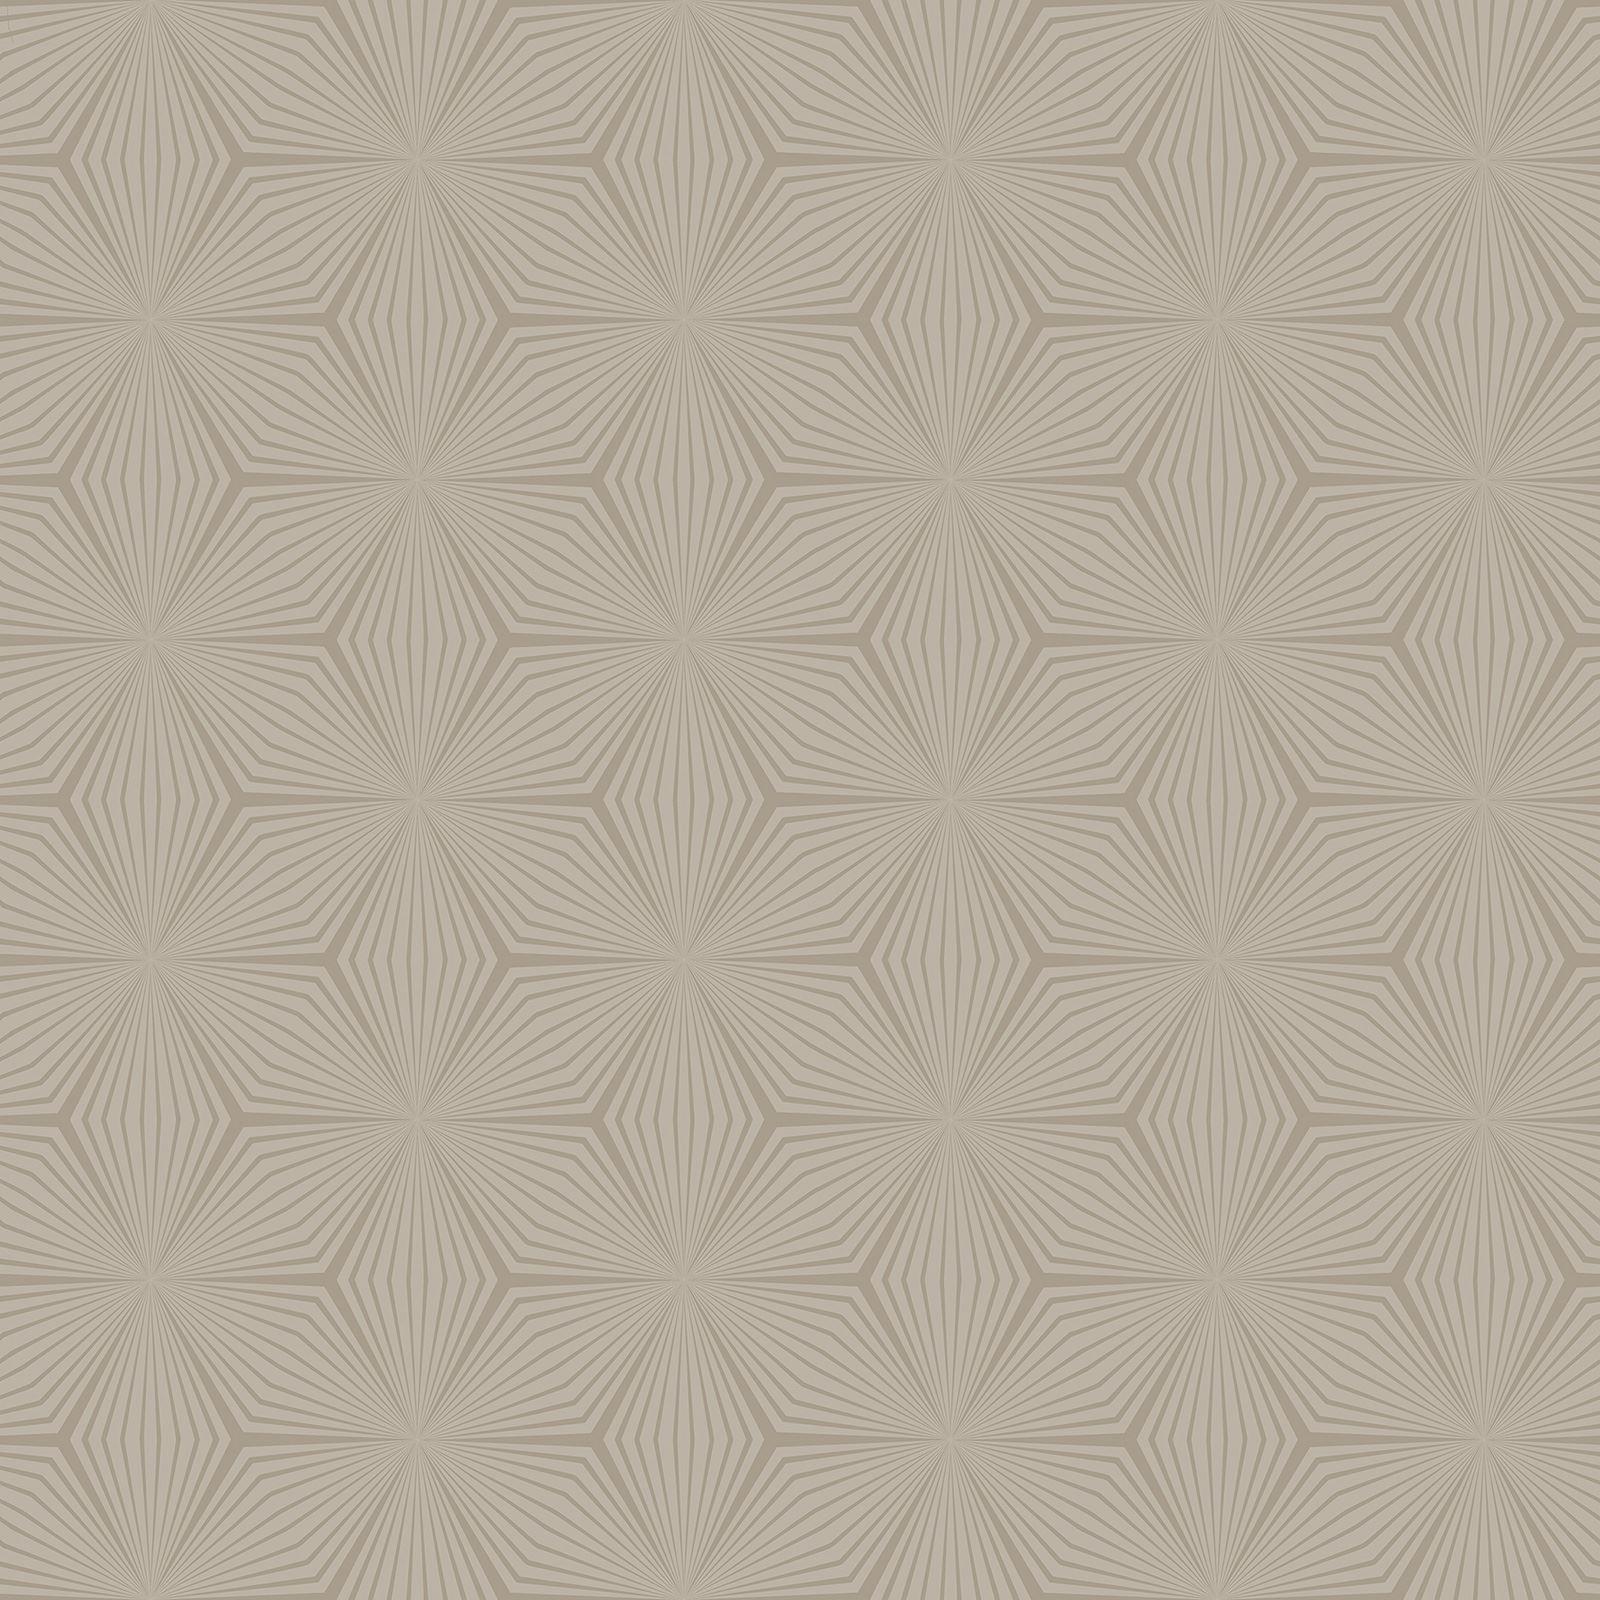 Holden decor geometrisch stern metallic matt tapete for Tapete schwarz silber